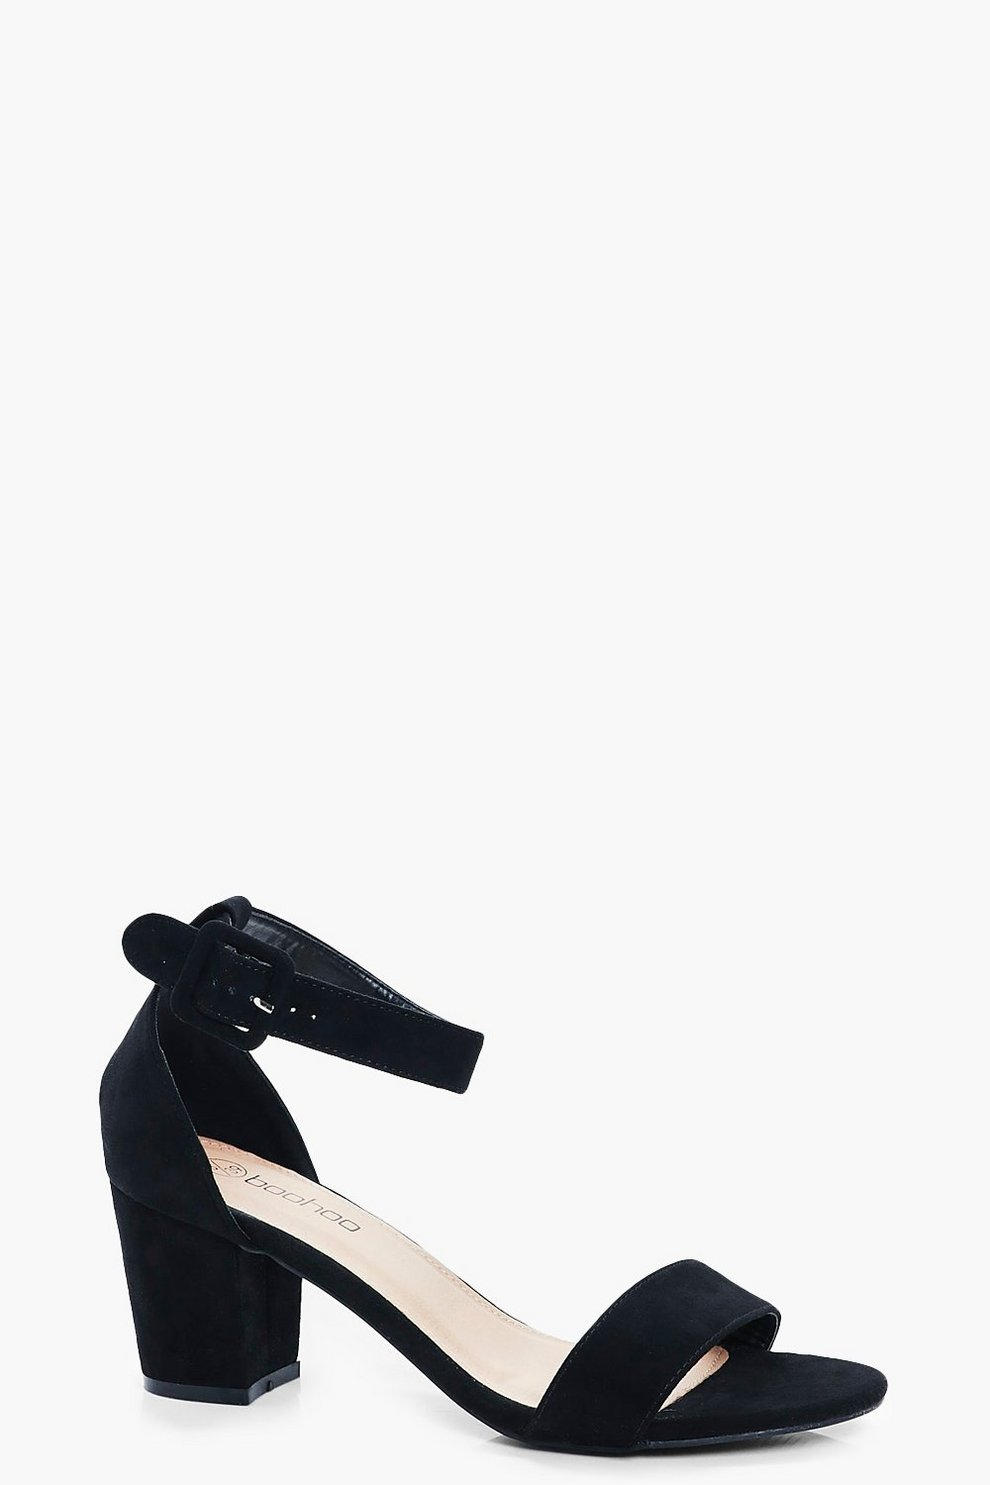 75ad084886e Wide Fit Low Block Heels